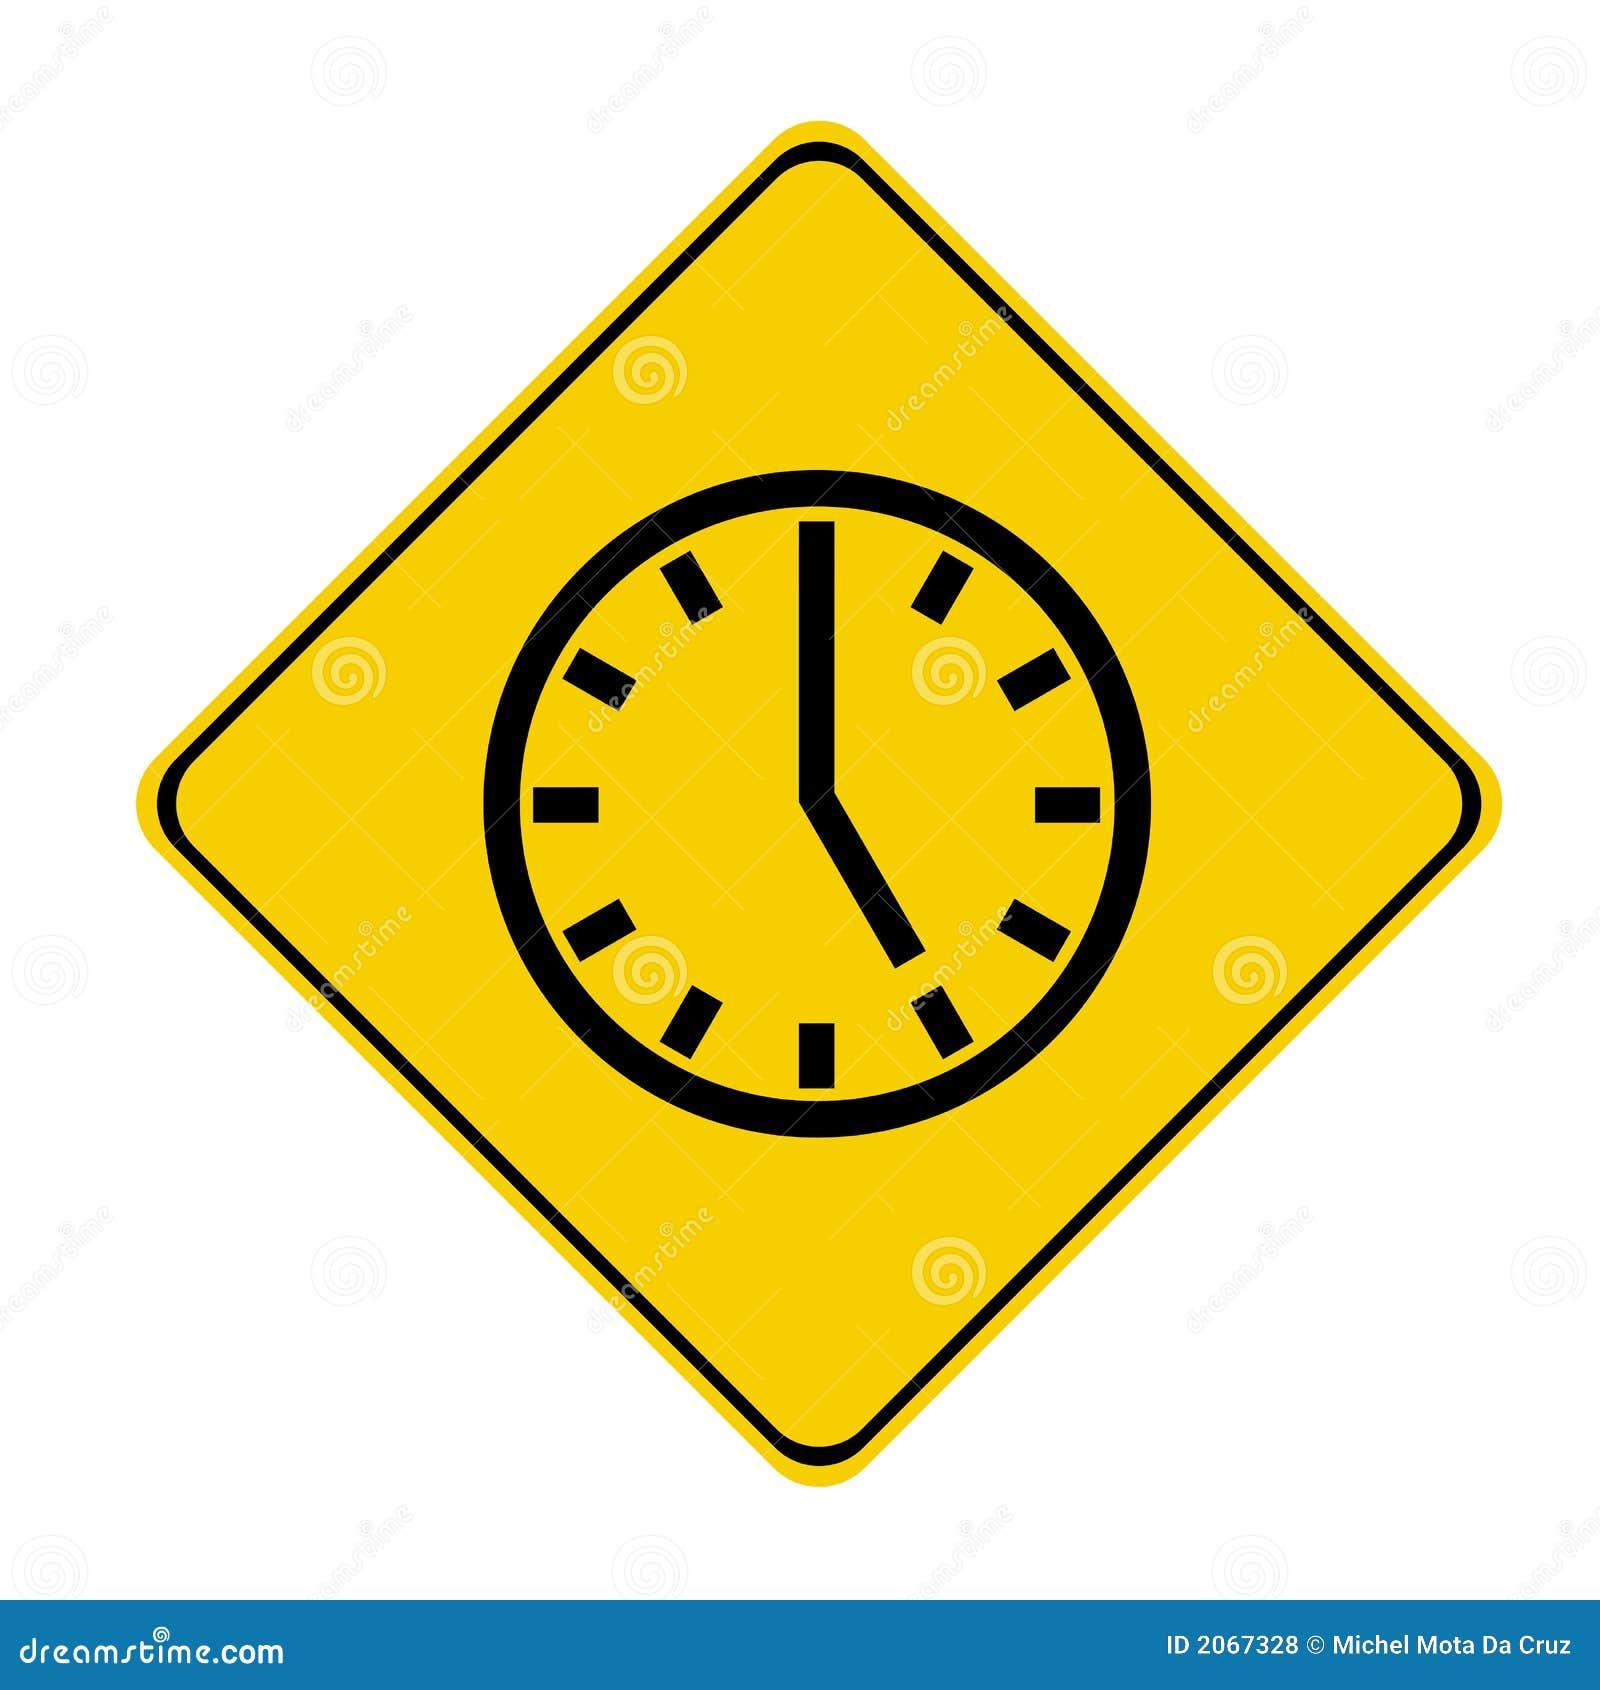 Clock sign royalty free stock photos image 2067328